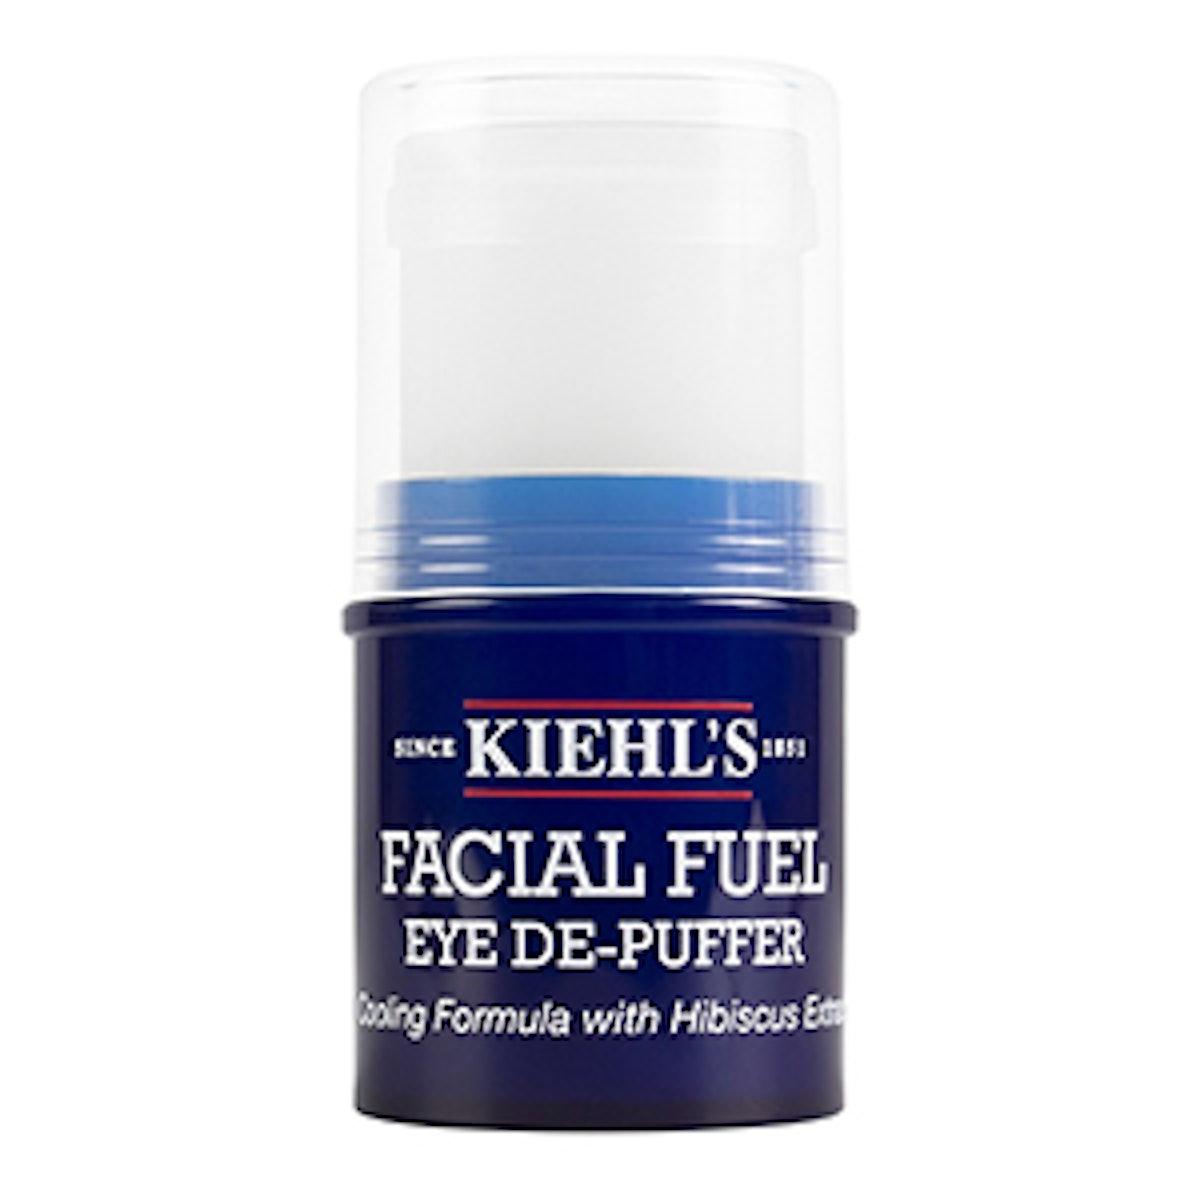 'Facial Fuel' Eye De-Puffer